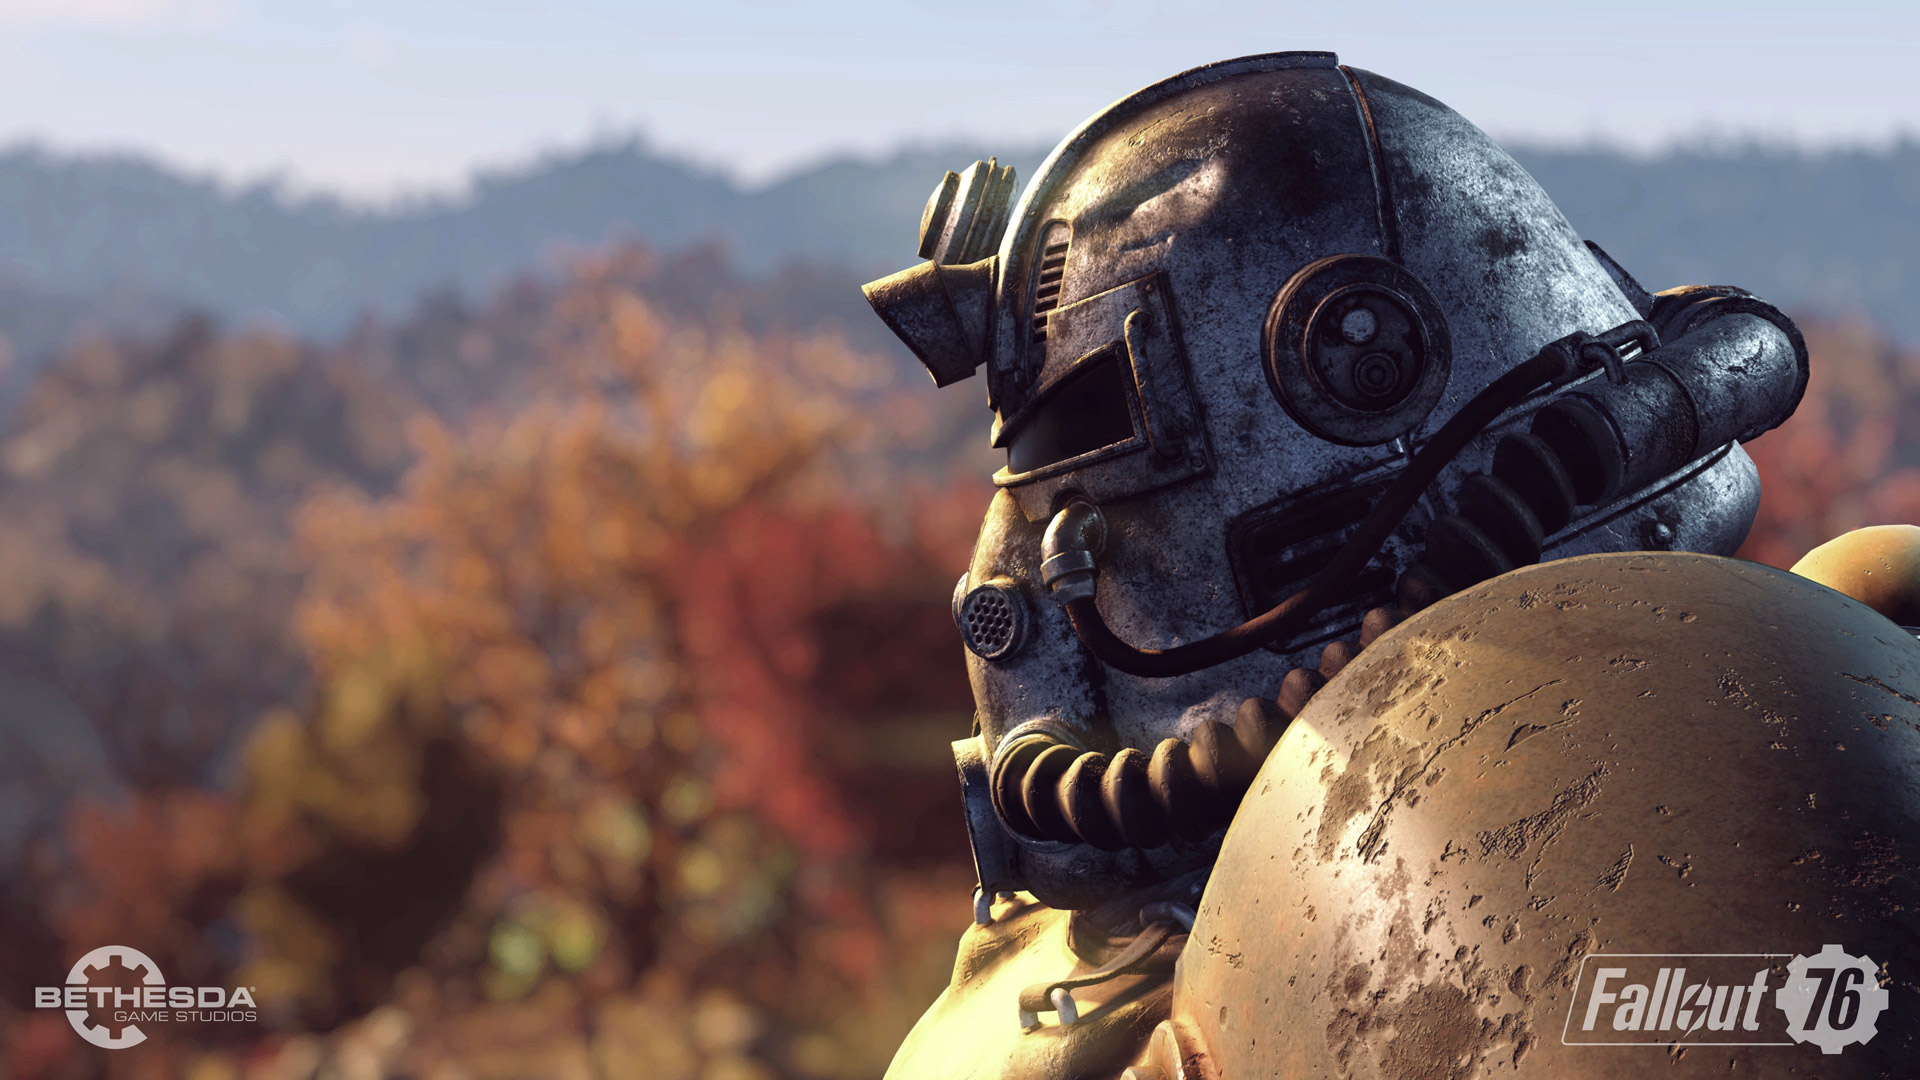 Fallout 76 Wallpaper in 1920x1080